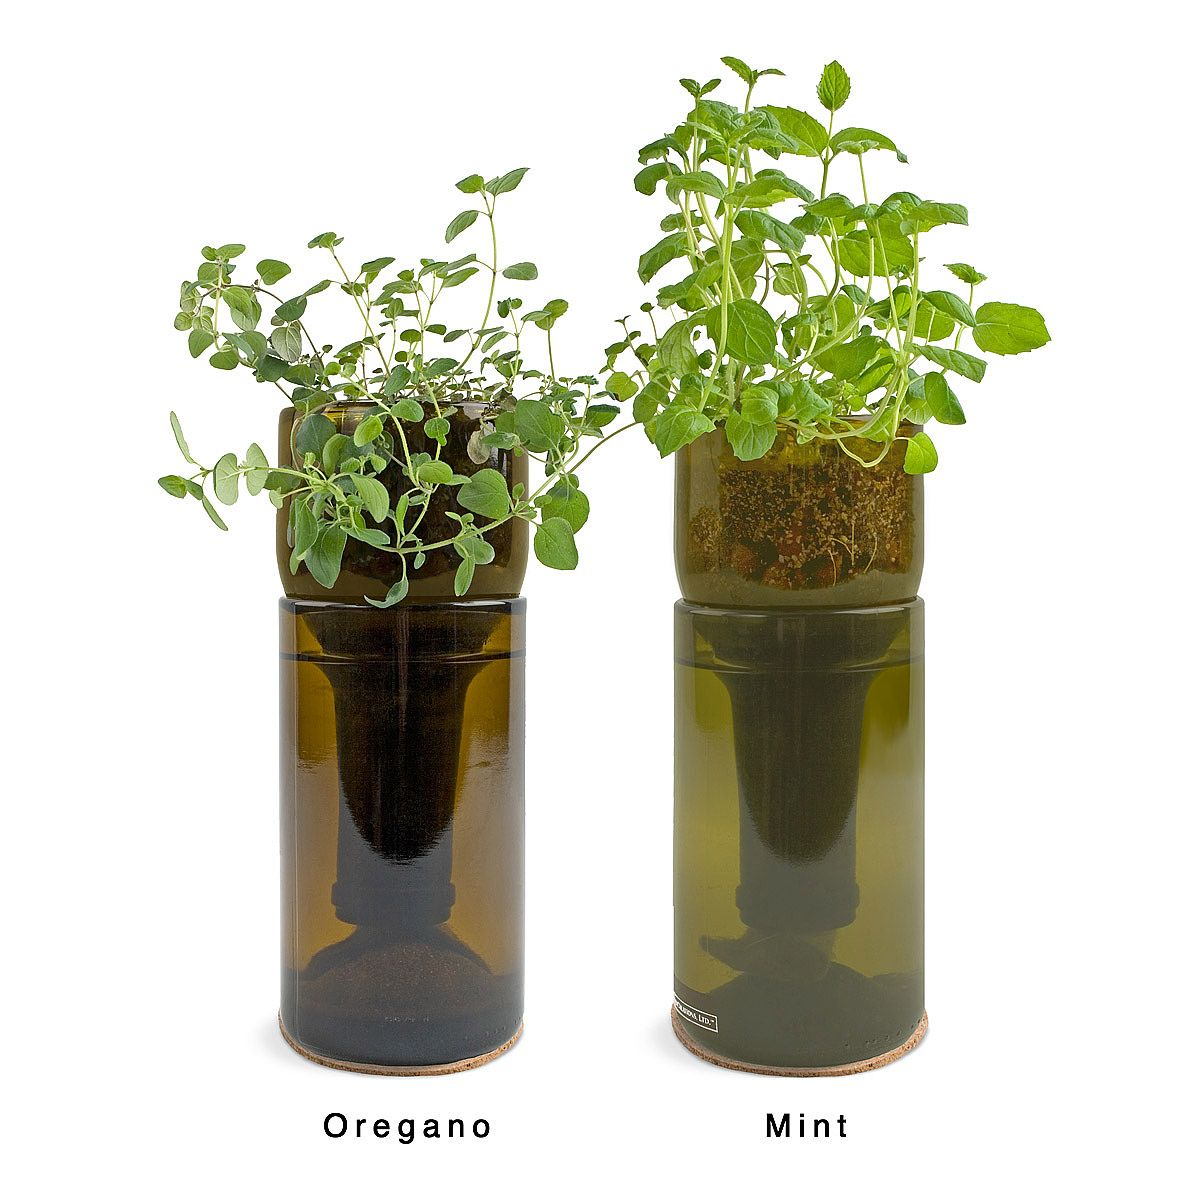 GrowBottle | Herb garden kit, Indoor herbs and Bottle